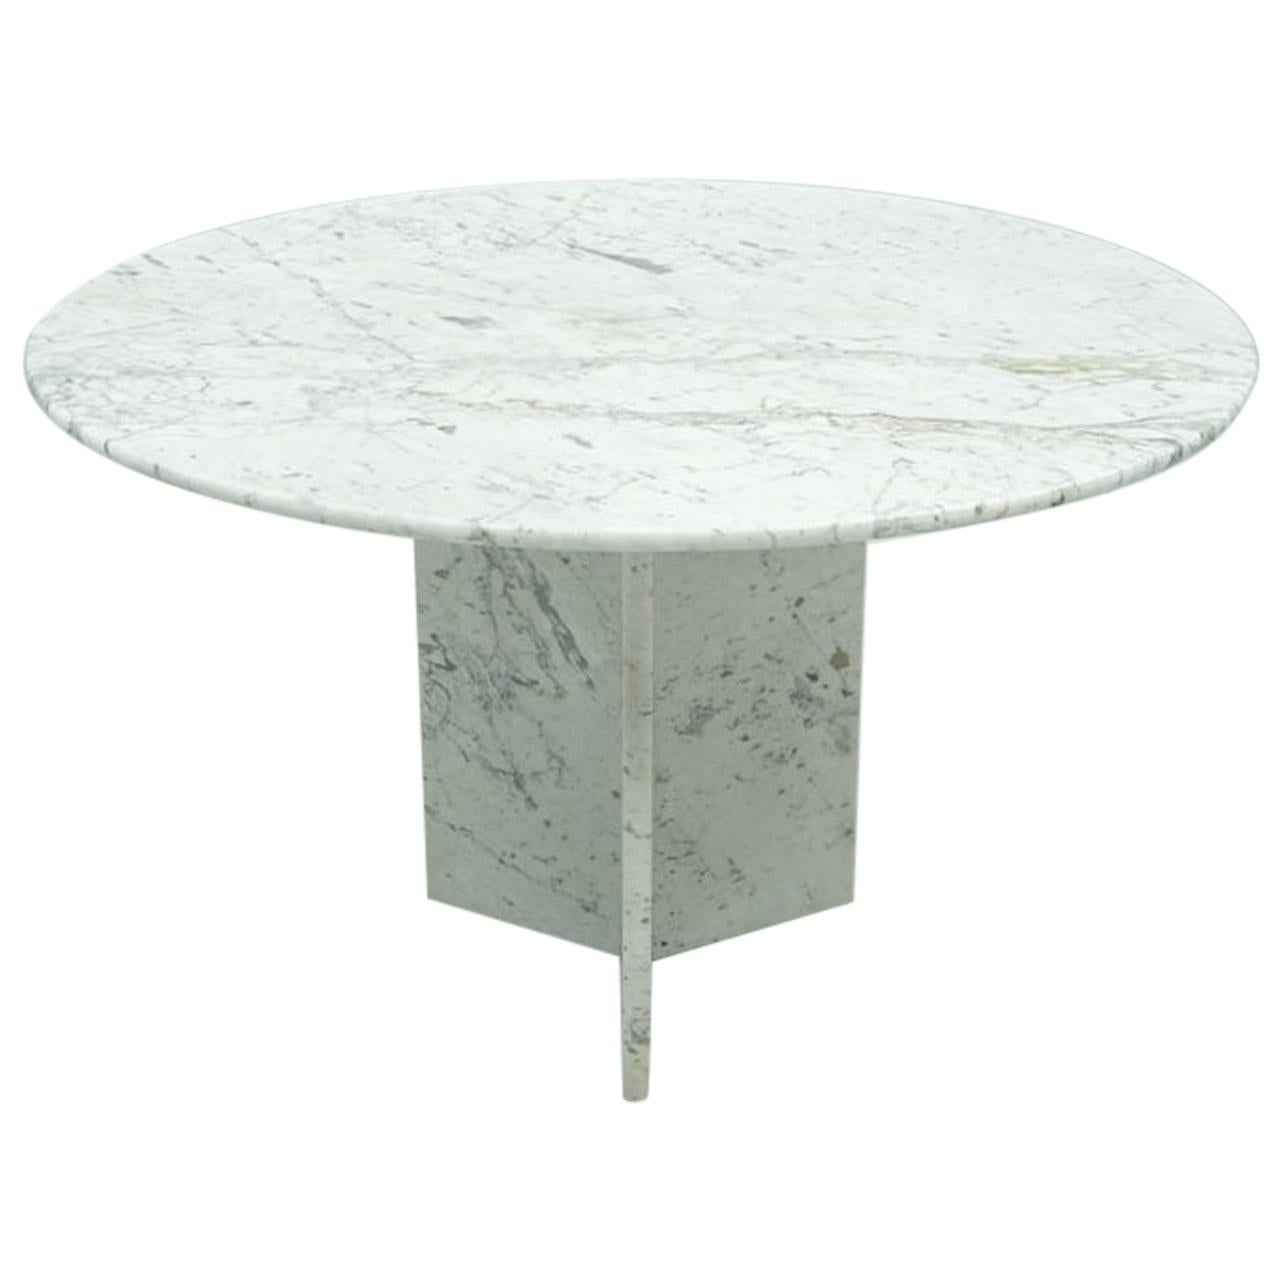 Circular Carrara Marble Dining Table, Italy, 1970s